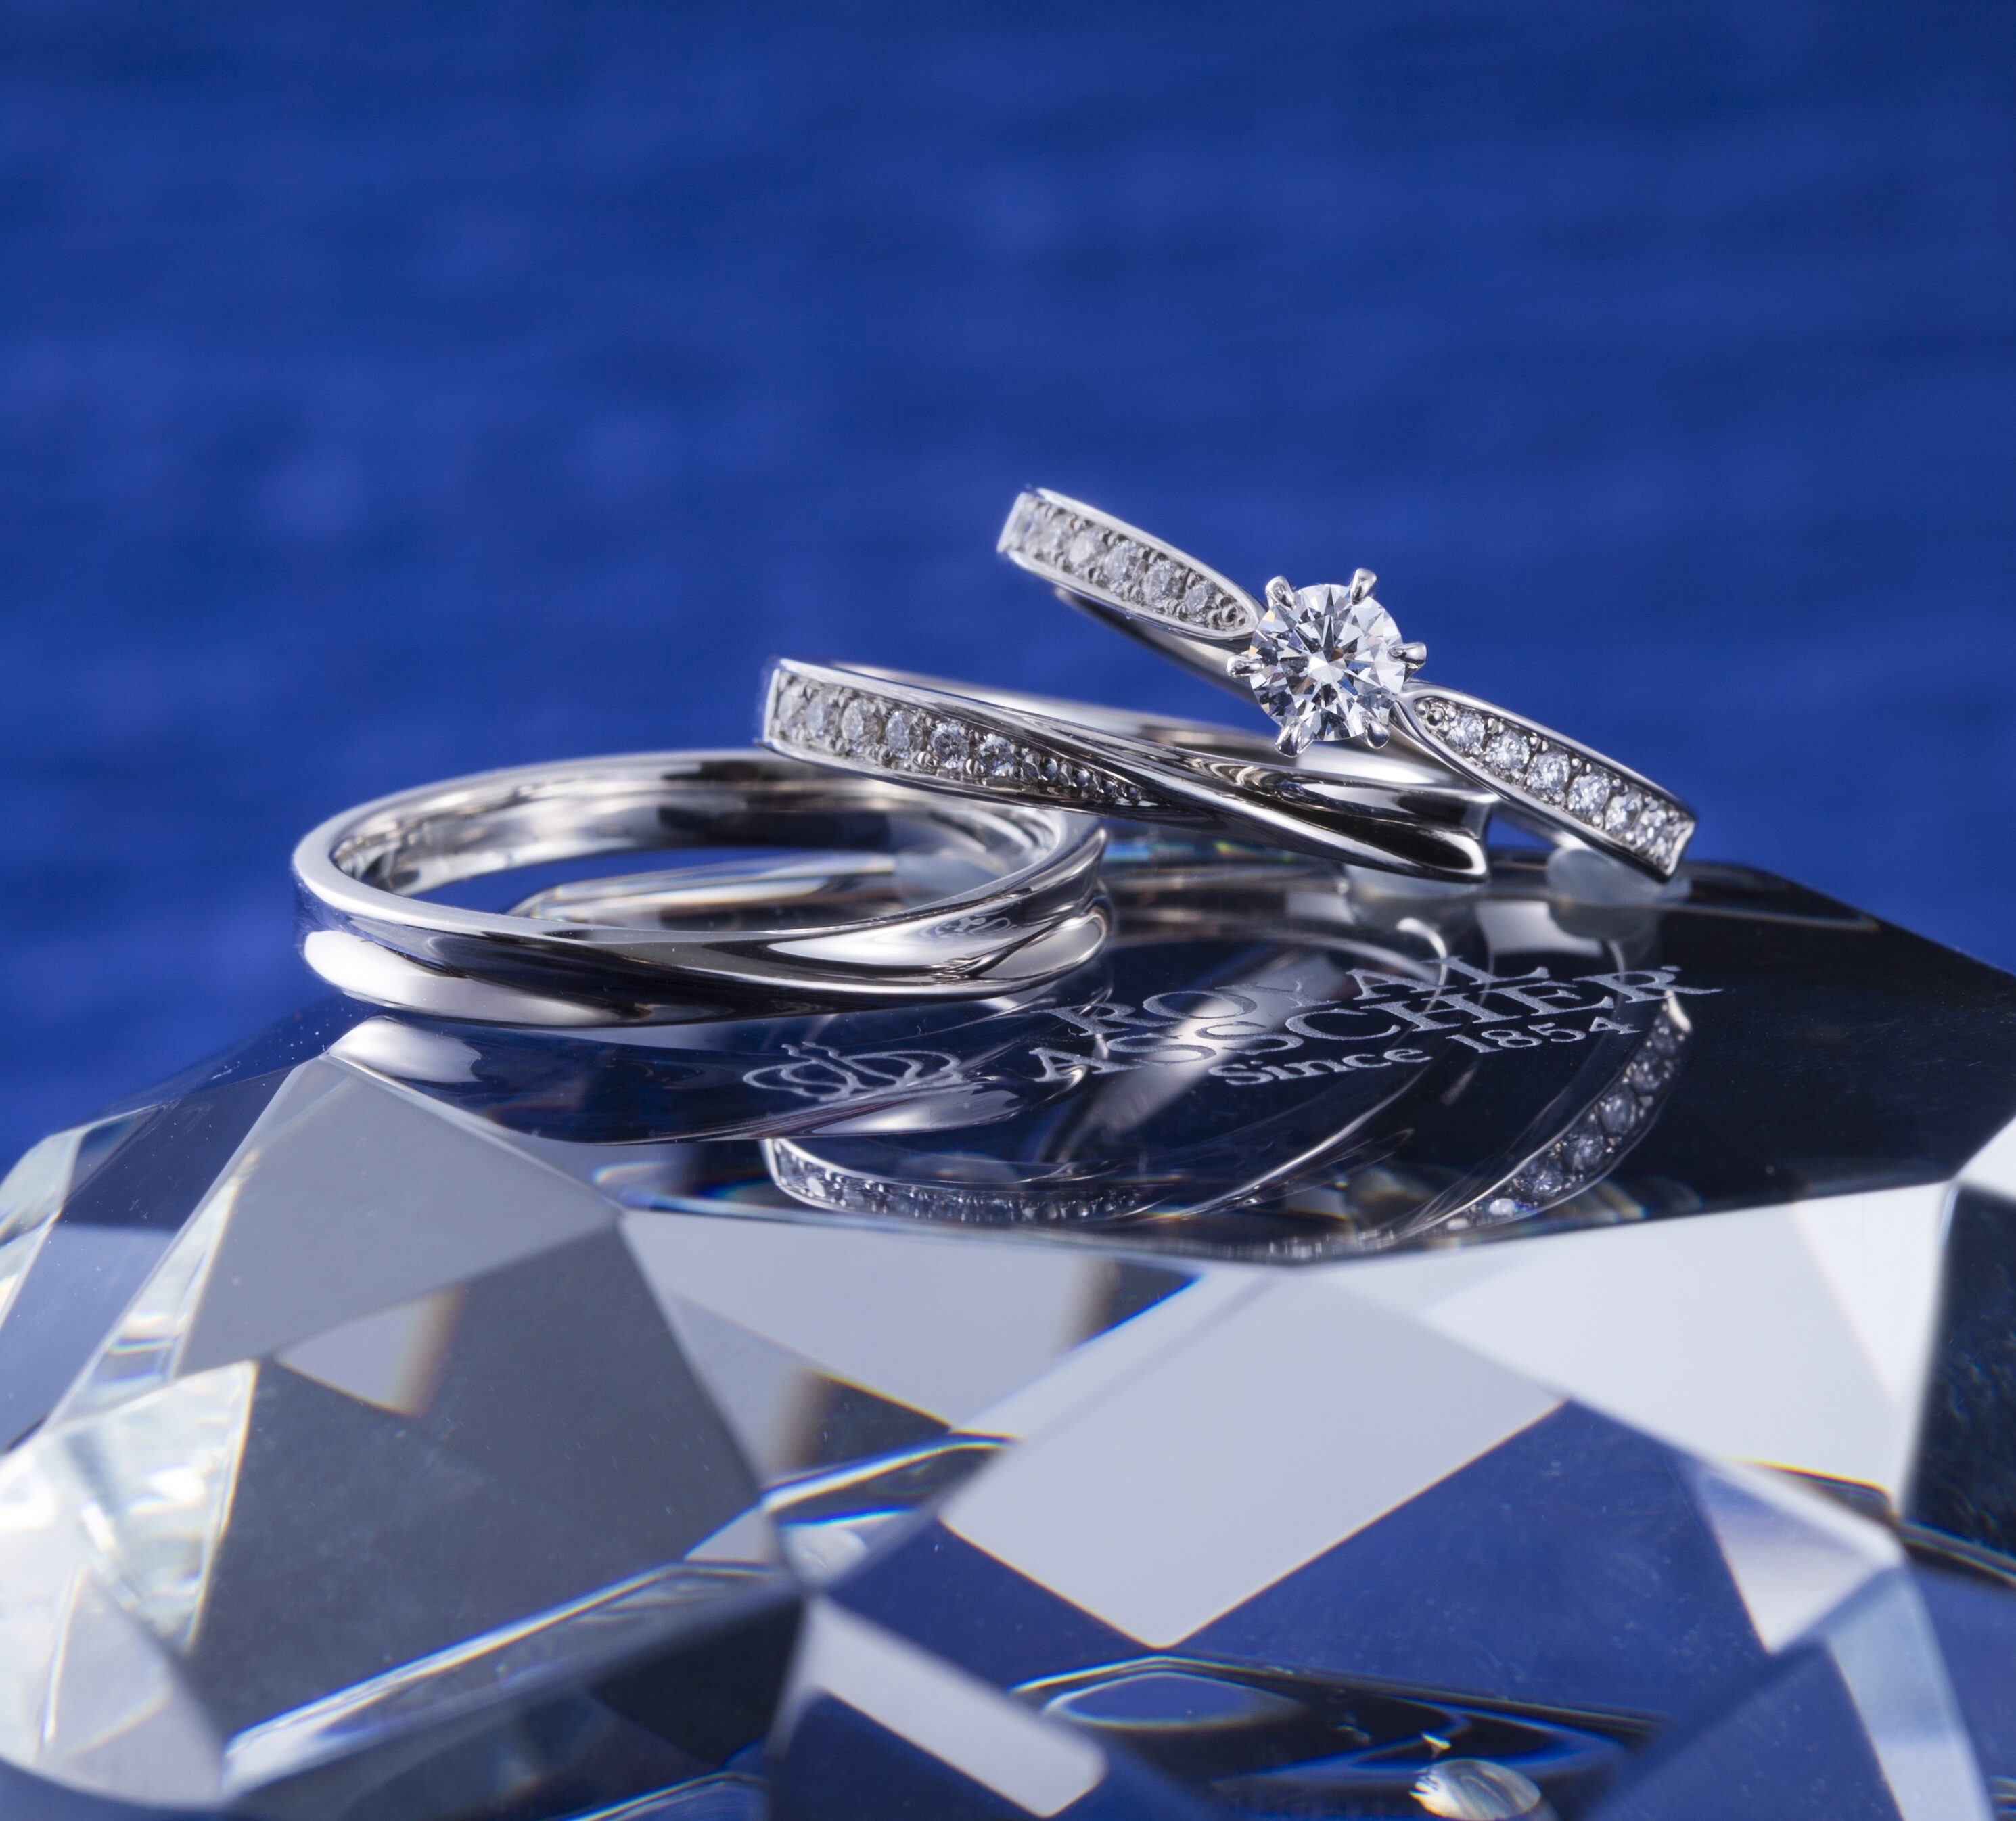 ERA806 WRA050 WRB060|ロイヤルアッシャー婚約指輪・結婚指輪